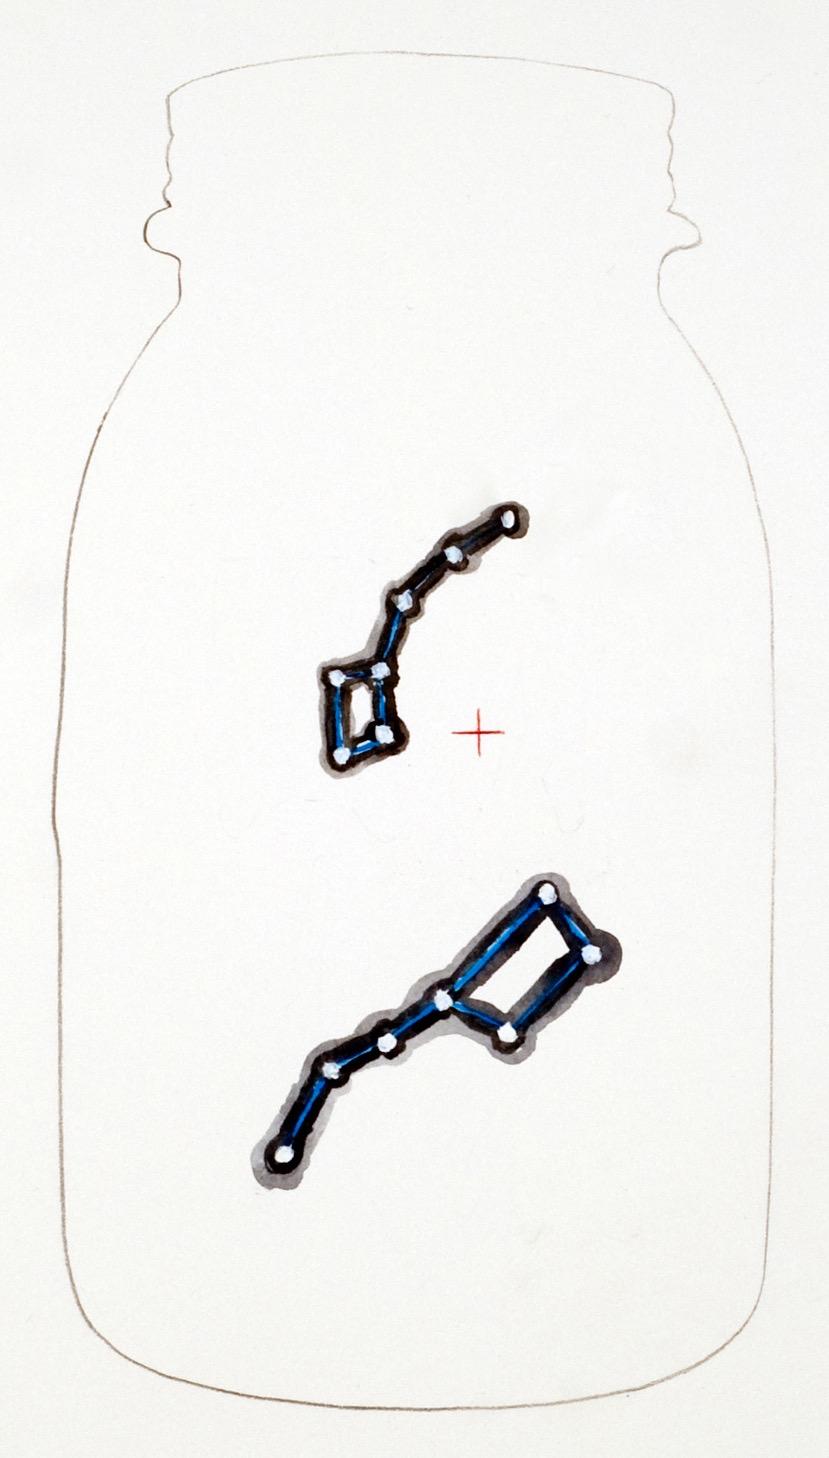 patoka hill 19, 2012  graphite, gouache and color pencil on paper  12 x 12 inches